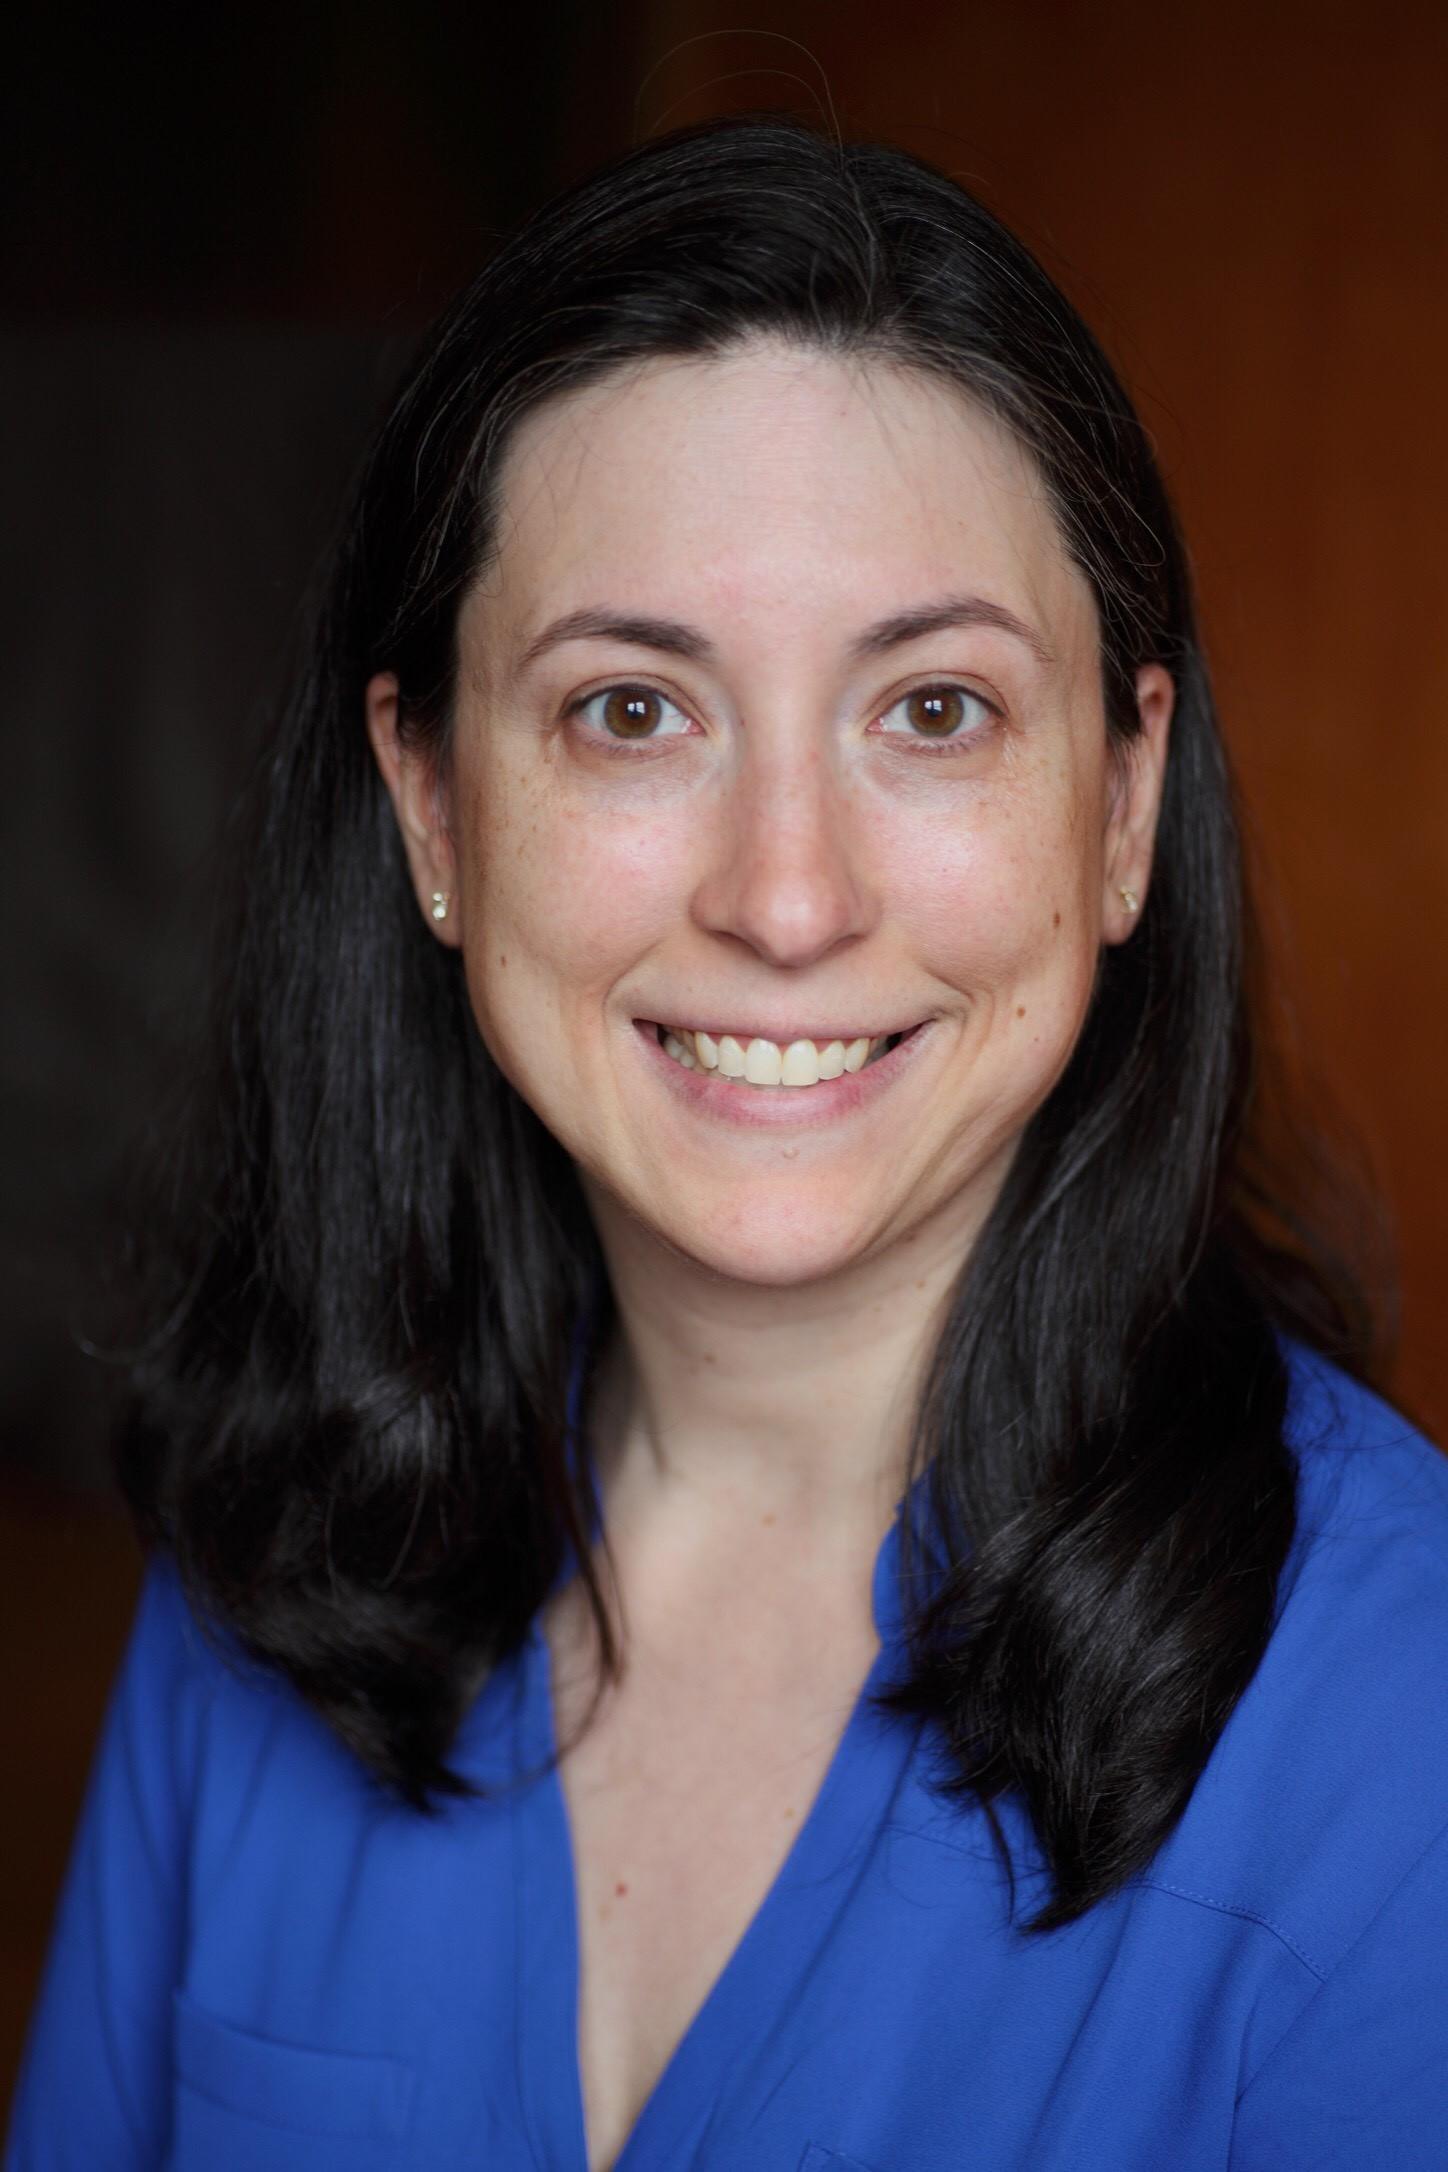 Lindsey McPherson